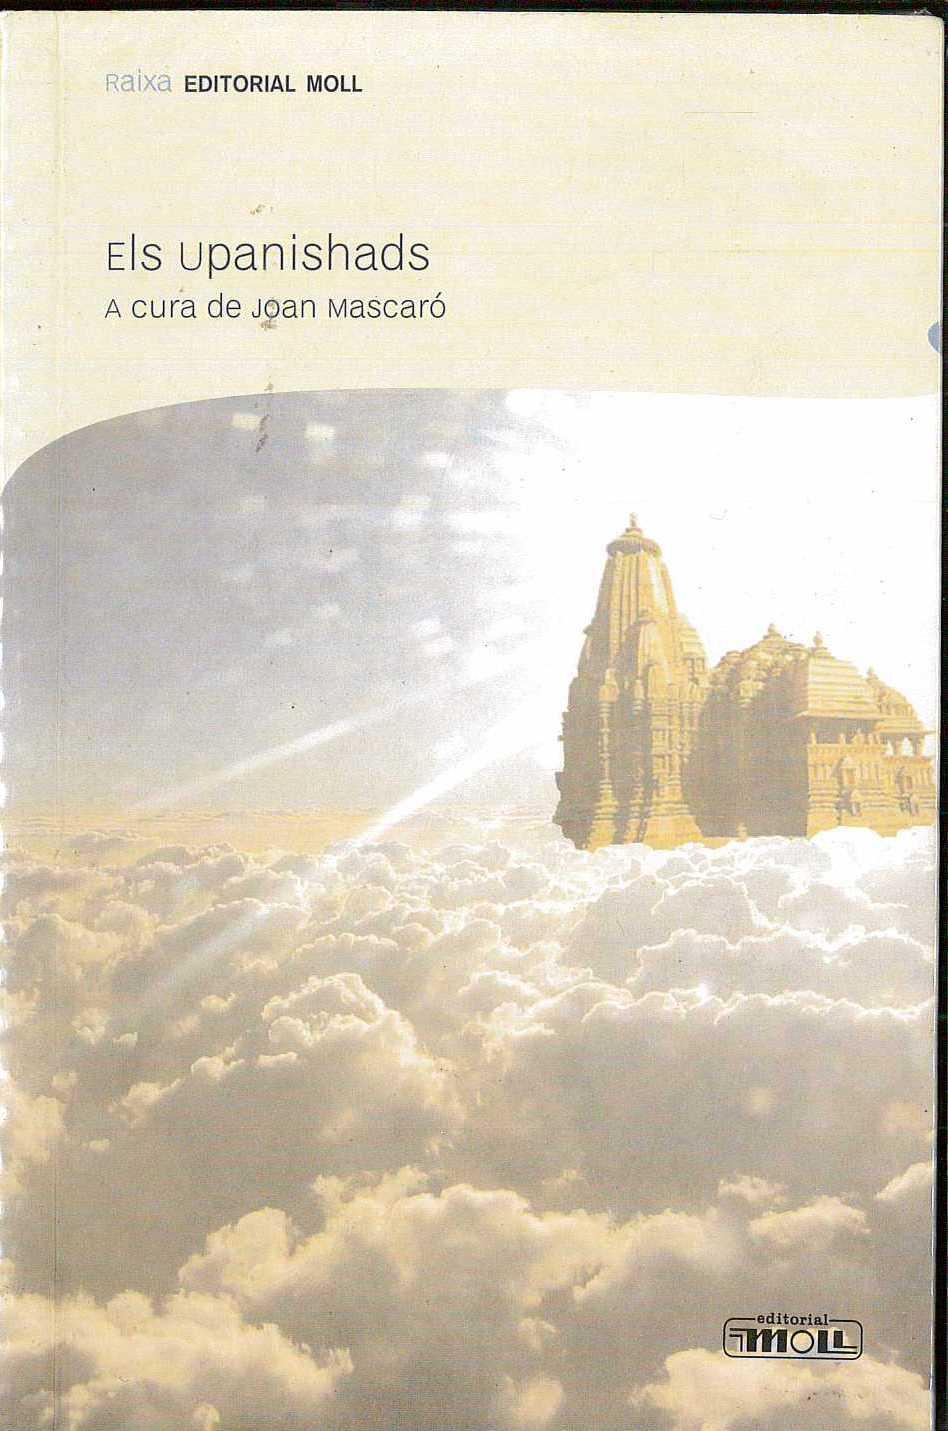 Els upanishads